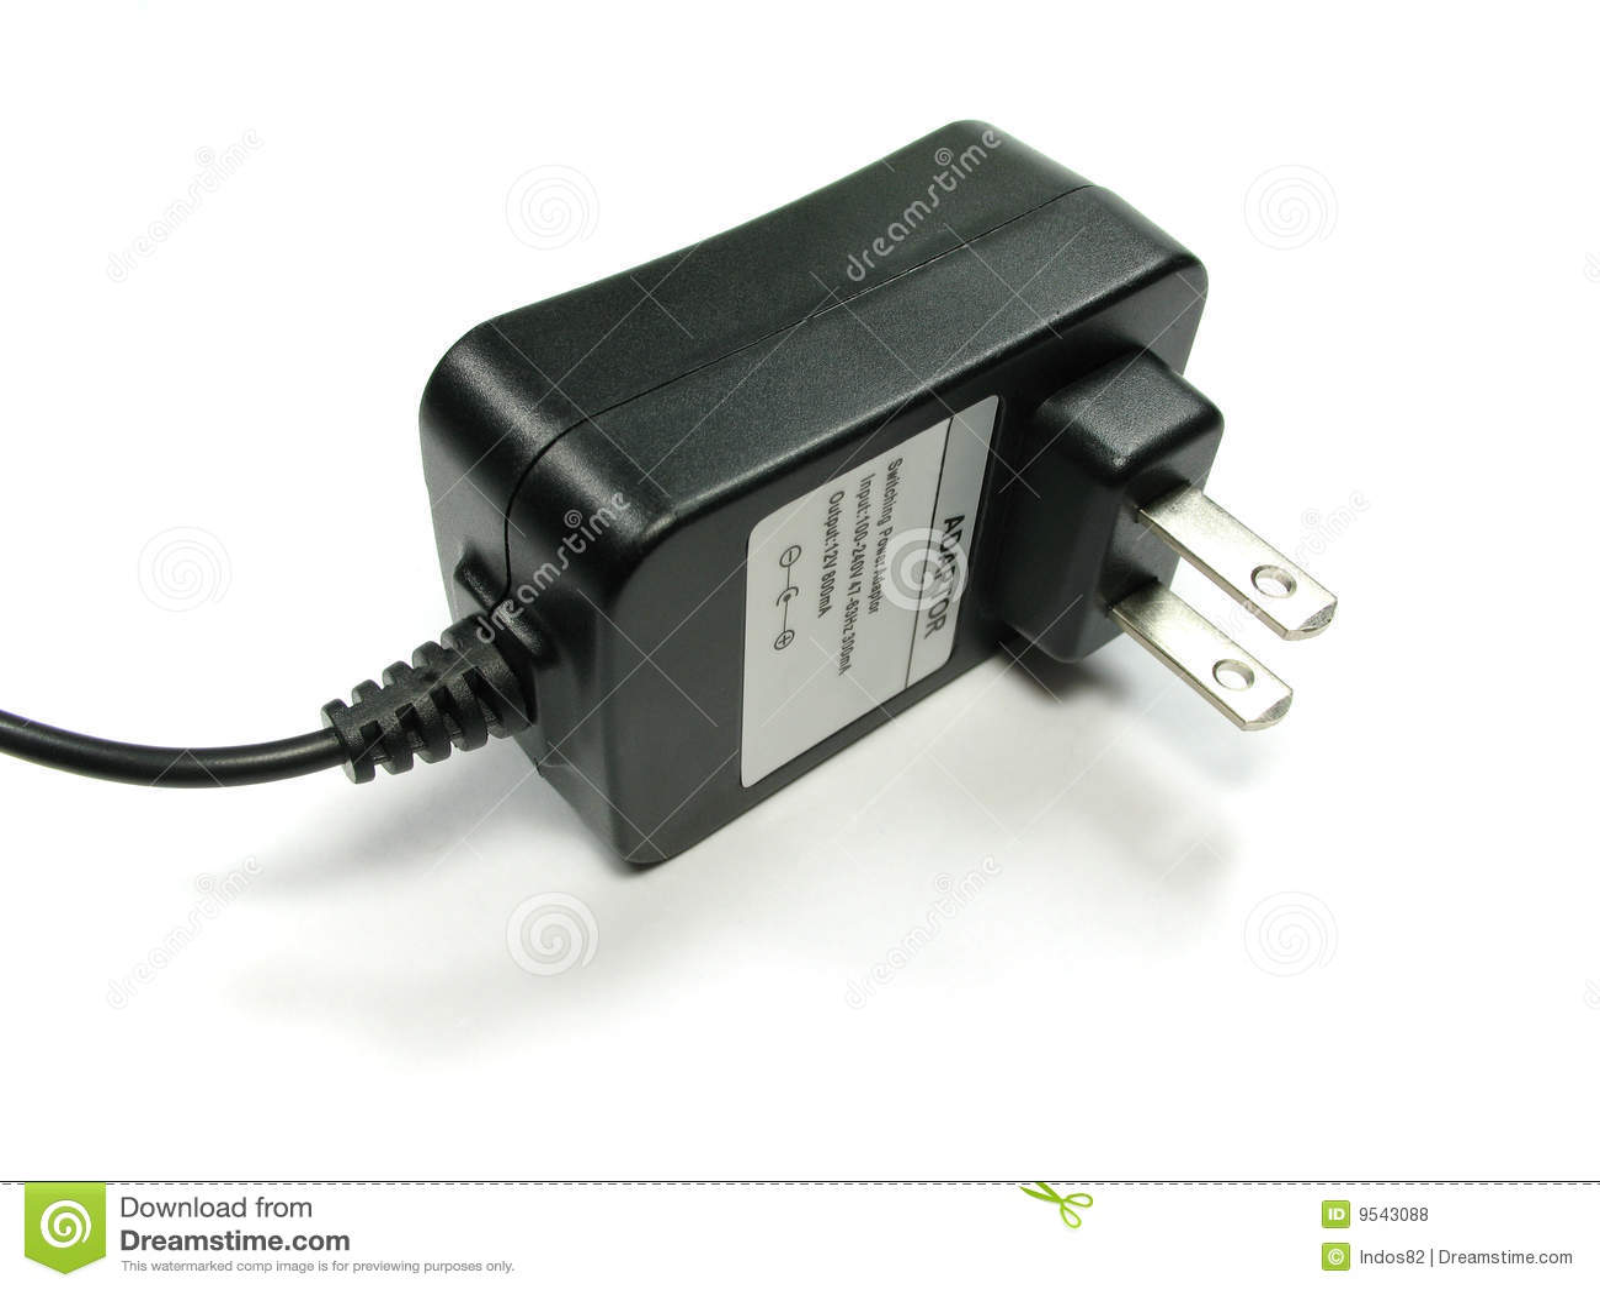 Cartoon Power Cord : Ac adapter royalty free stock image cartoondealer